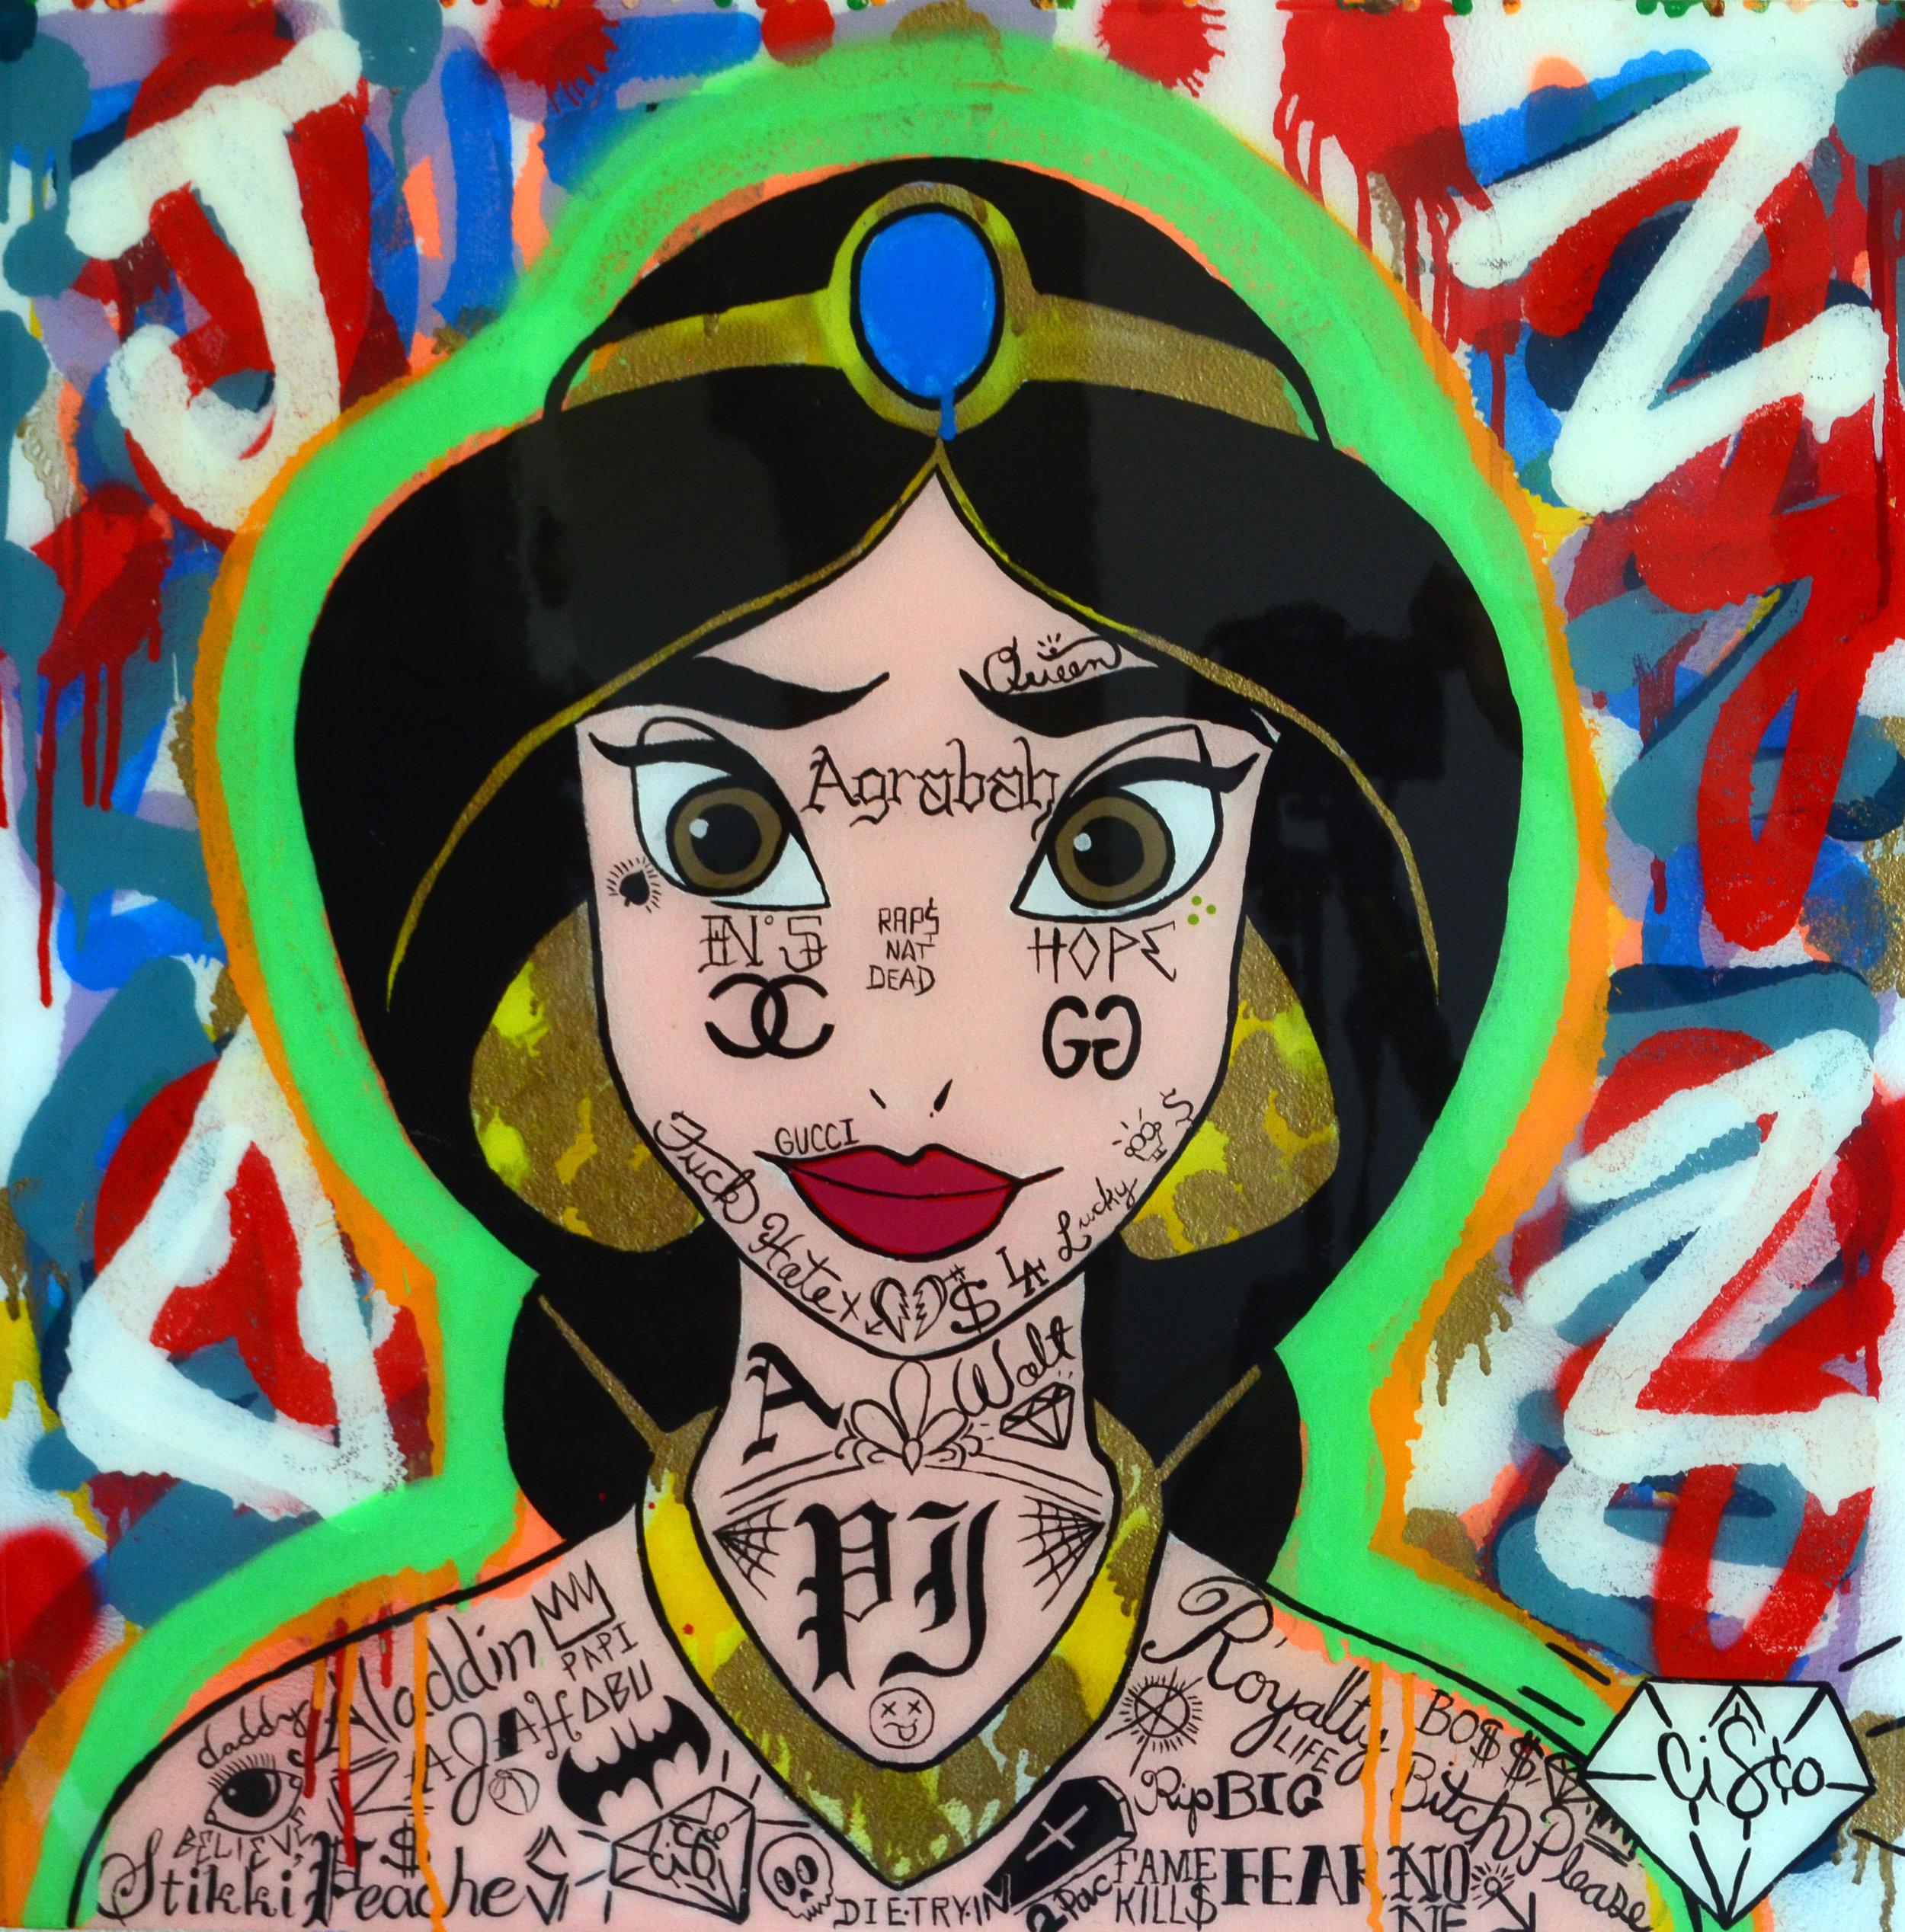 Cisco Lopez Jr Art_Cisco_Jasmine_22inx22in_Acrylic On Wood Panel Canvas_Edition 1of1_2018_$1150.jpg